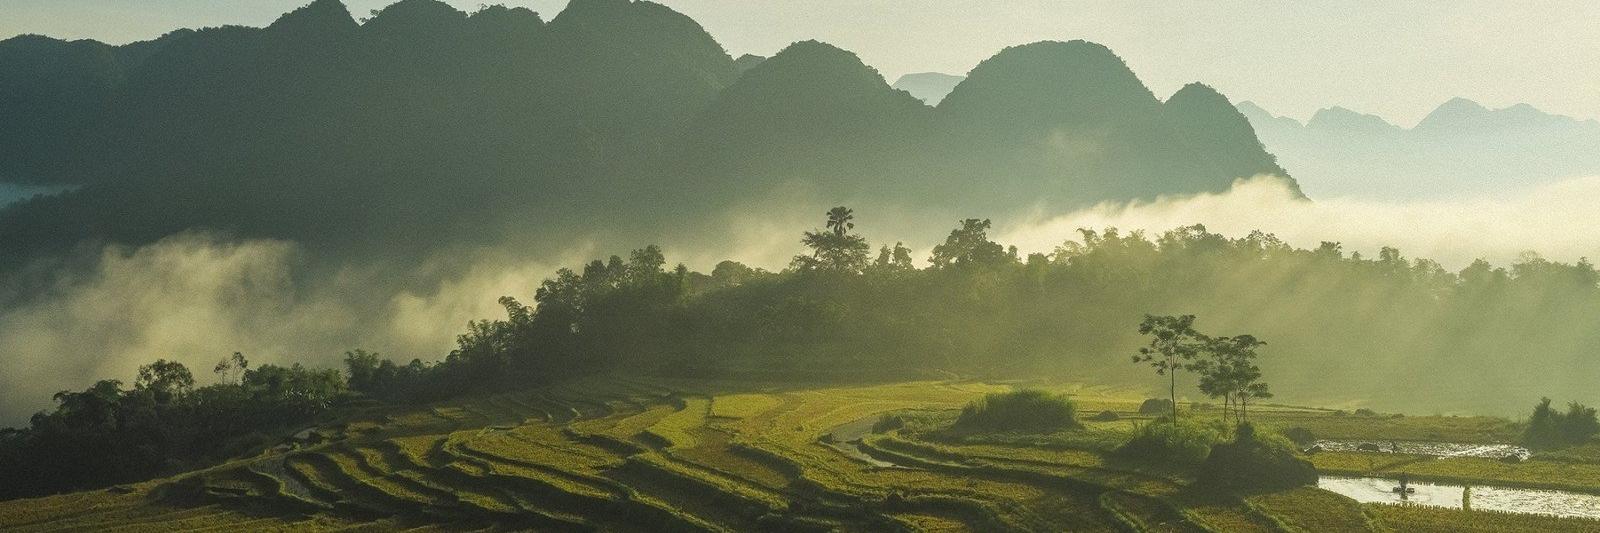 https://gody.vn/blog/sydan4693/post/kinh-nghiem-du-lich-pu-luong-oanh-tac-thien-duong-xu-thanh-4190